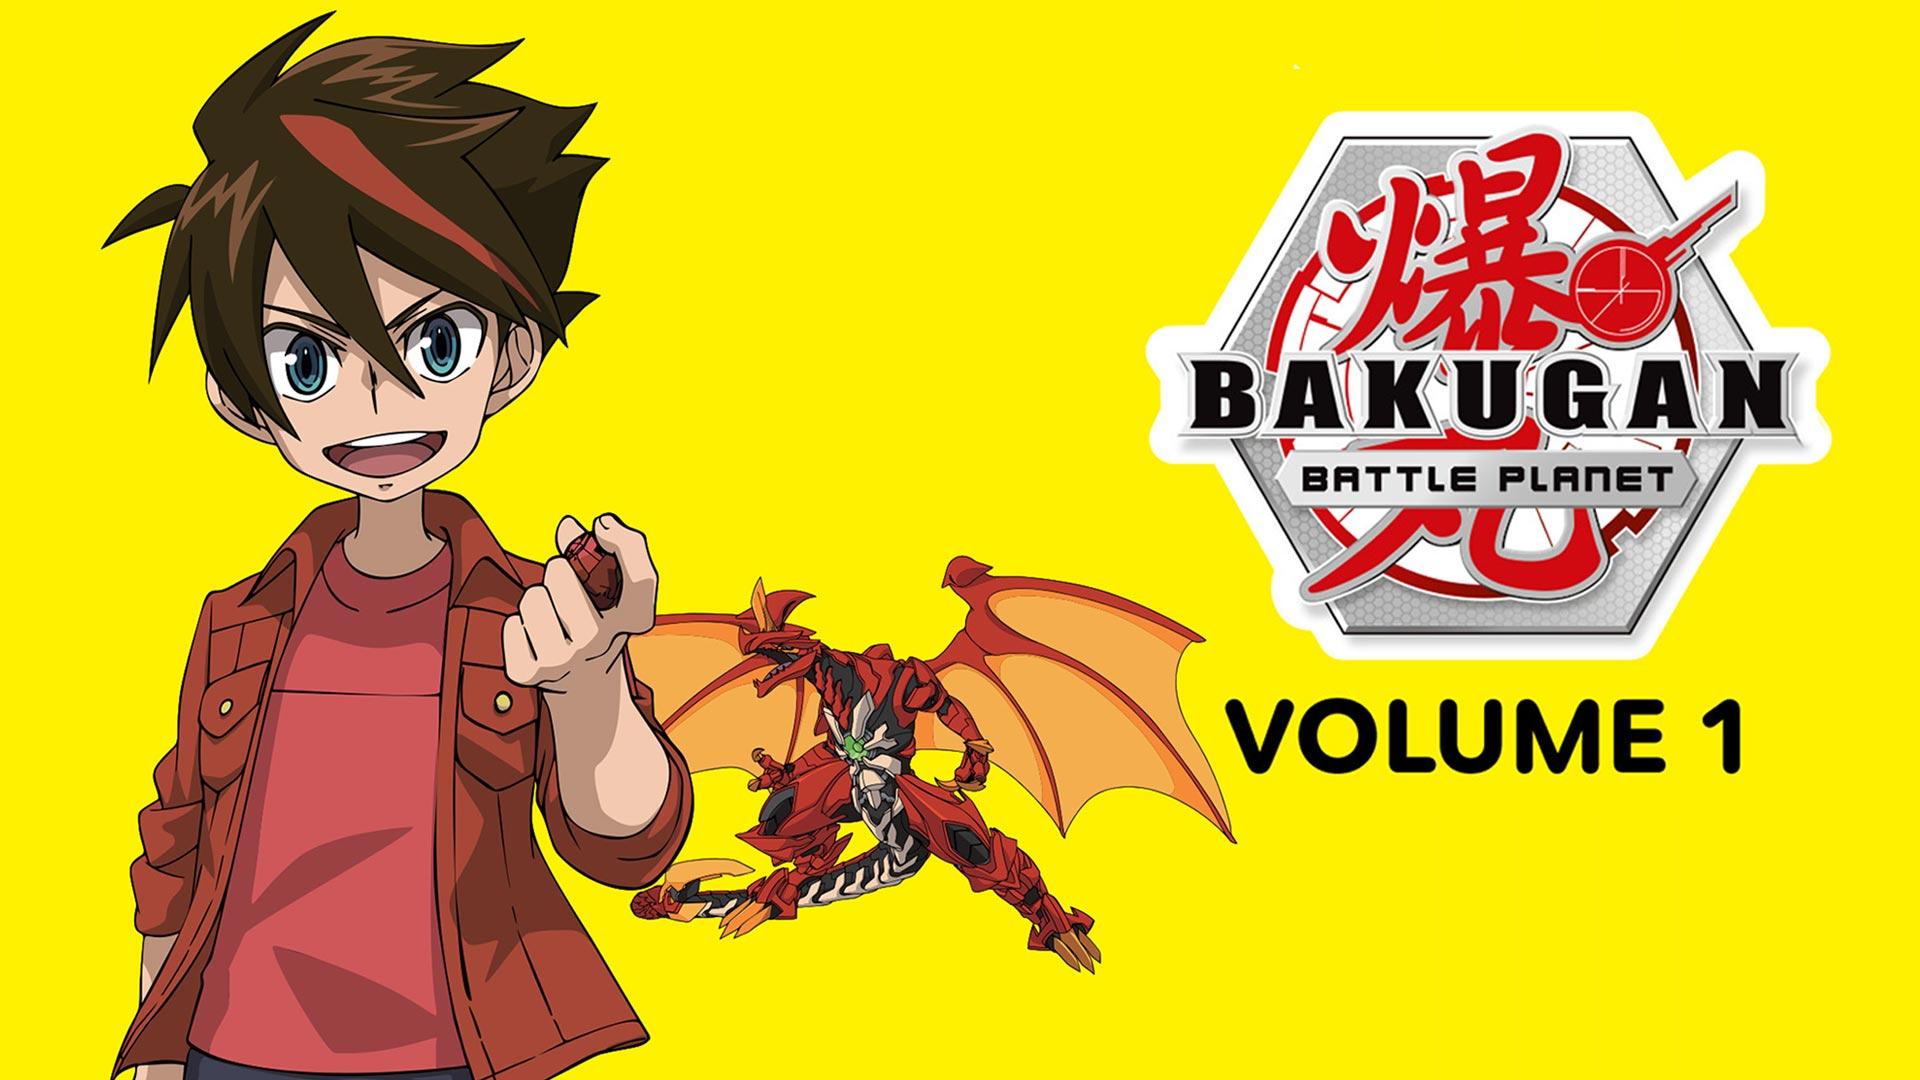 Bakugan: Battle Planet Season 1